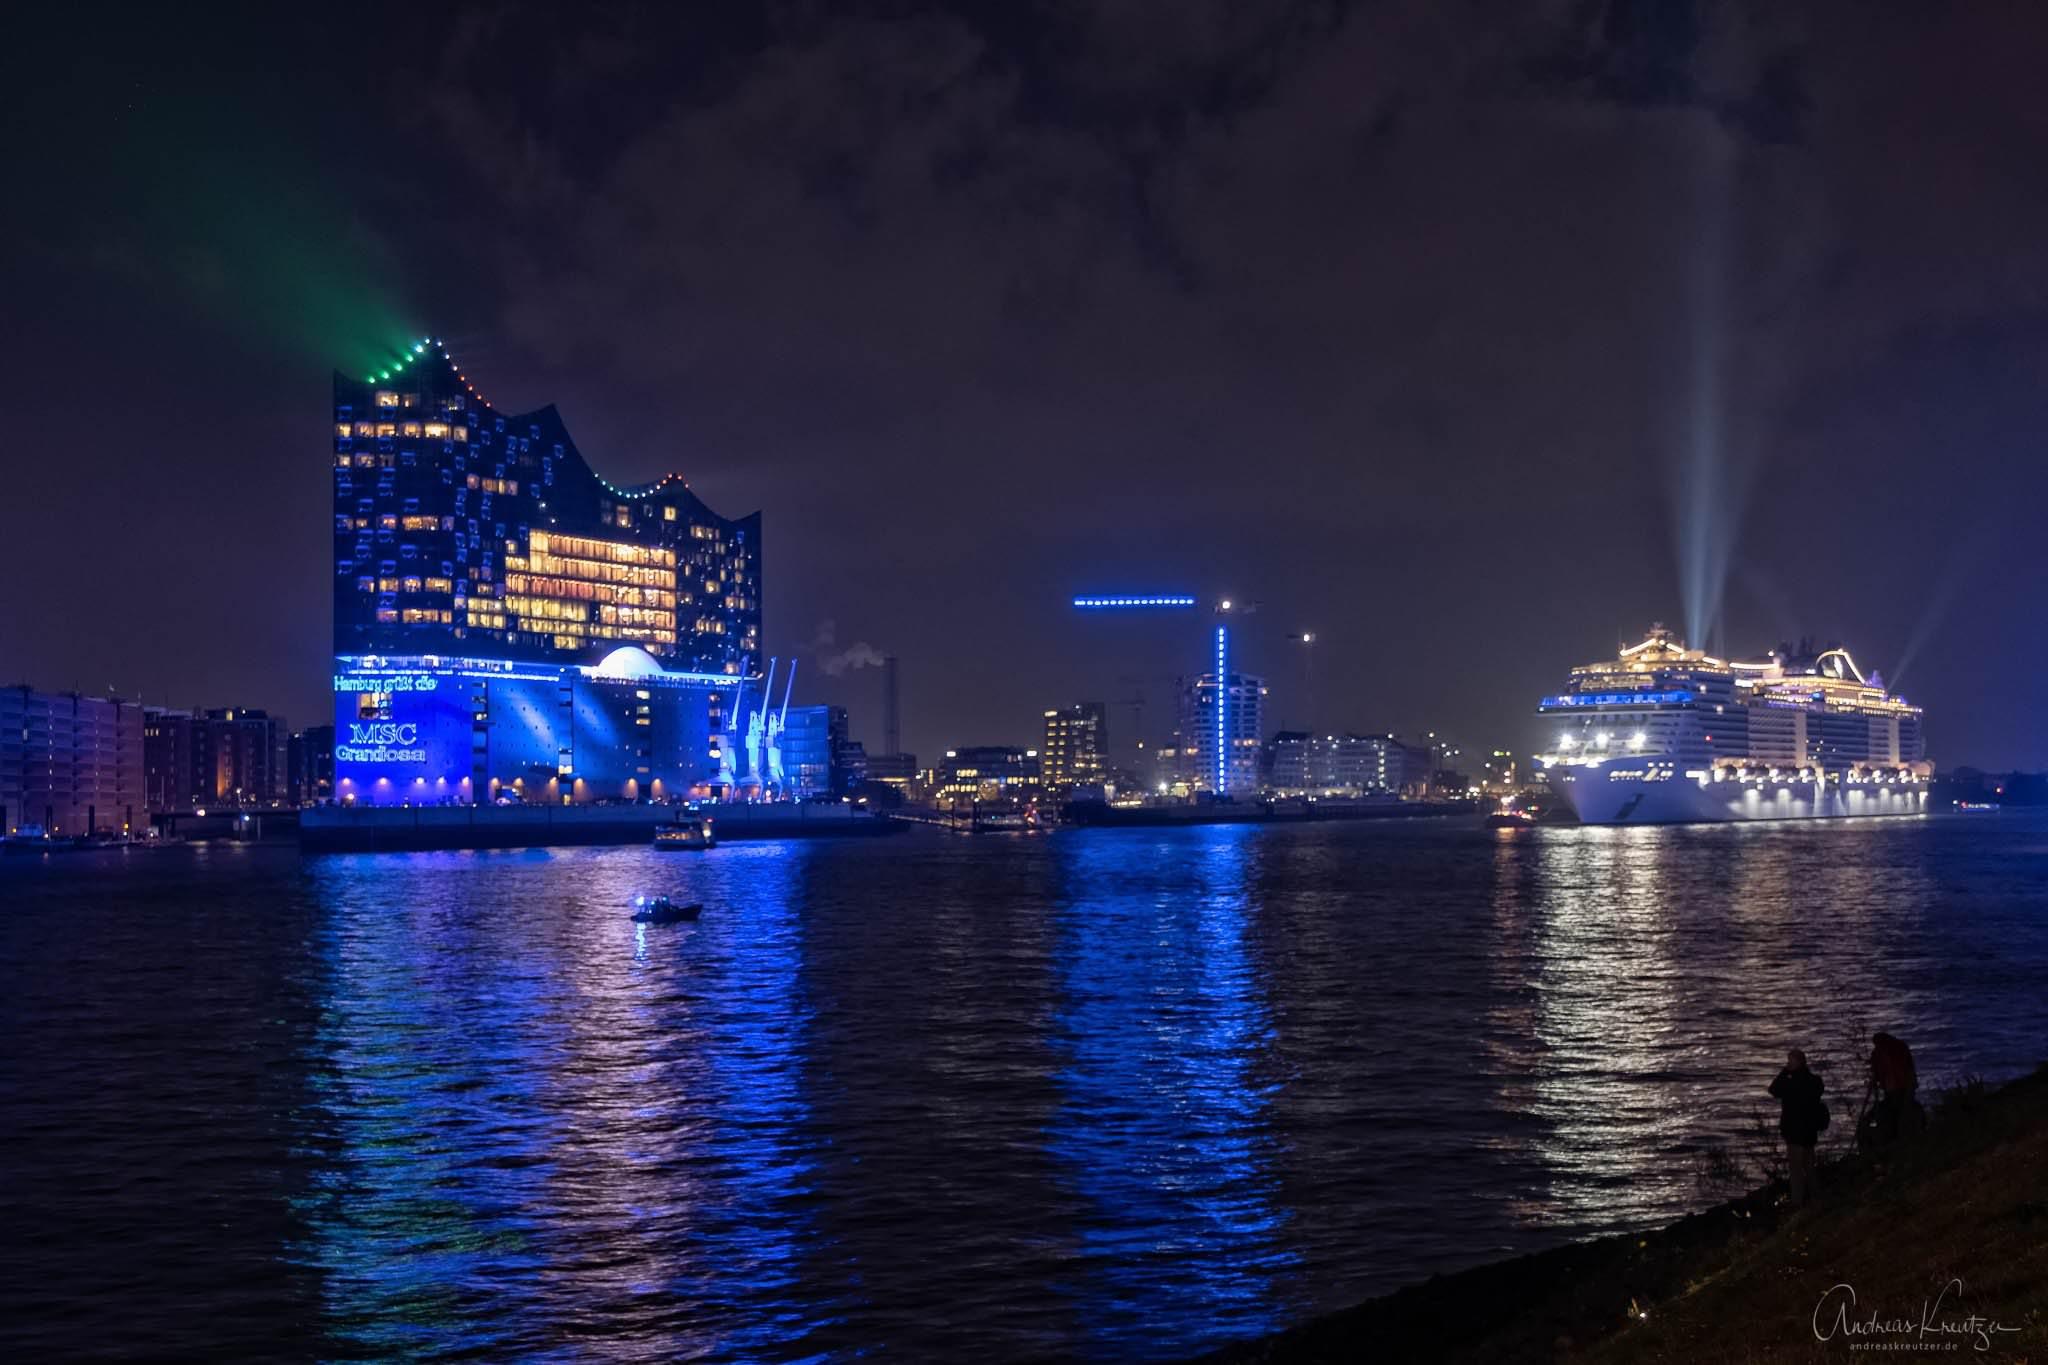 Taufe der MSC Grandiosa in Hamburg | Andreas Kreutzer ...